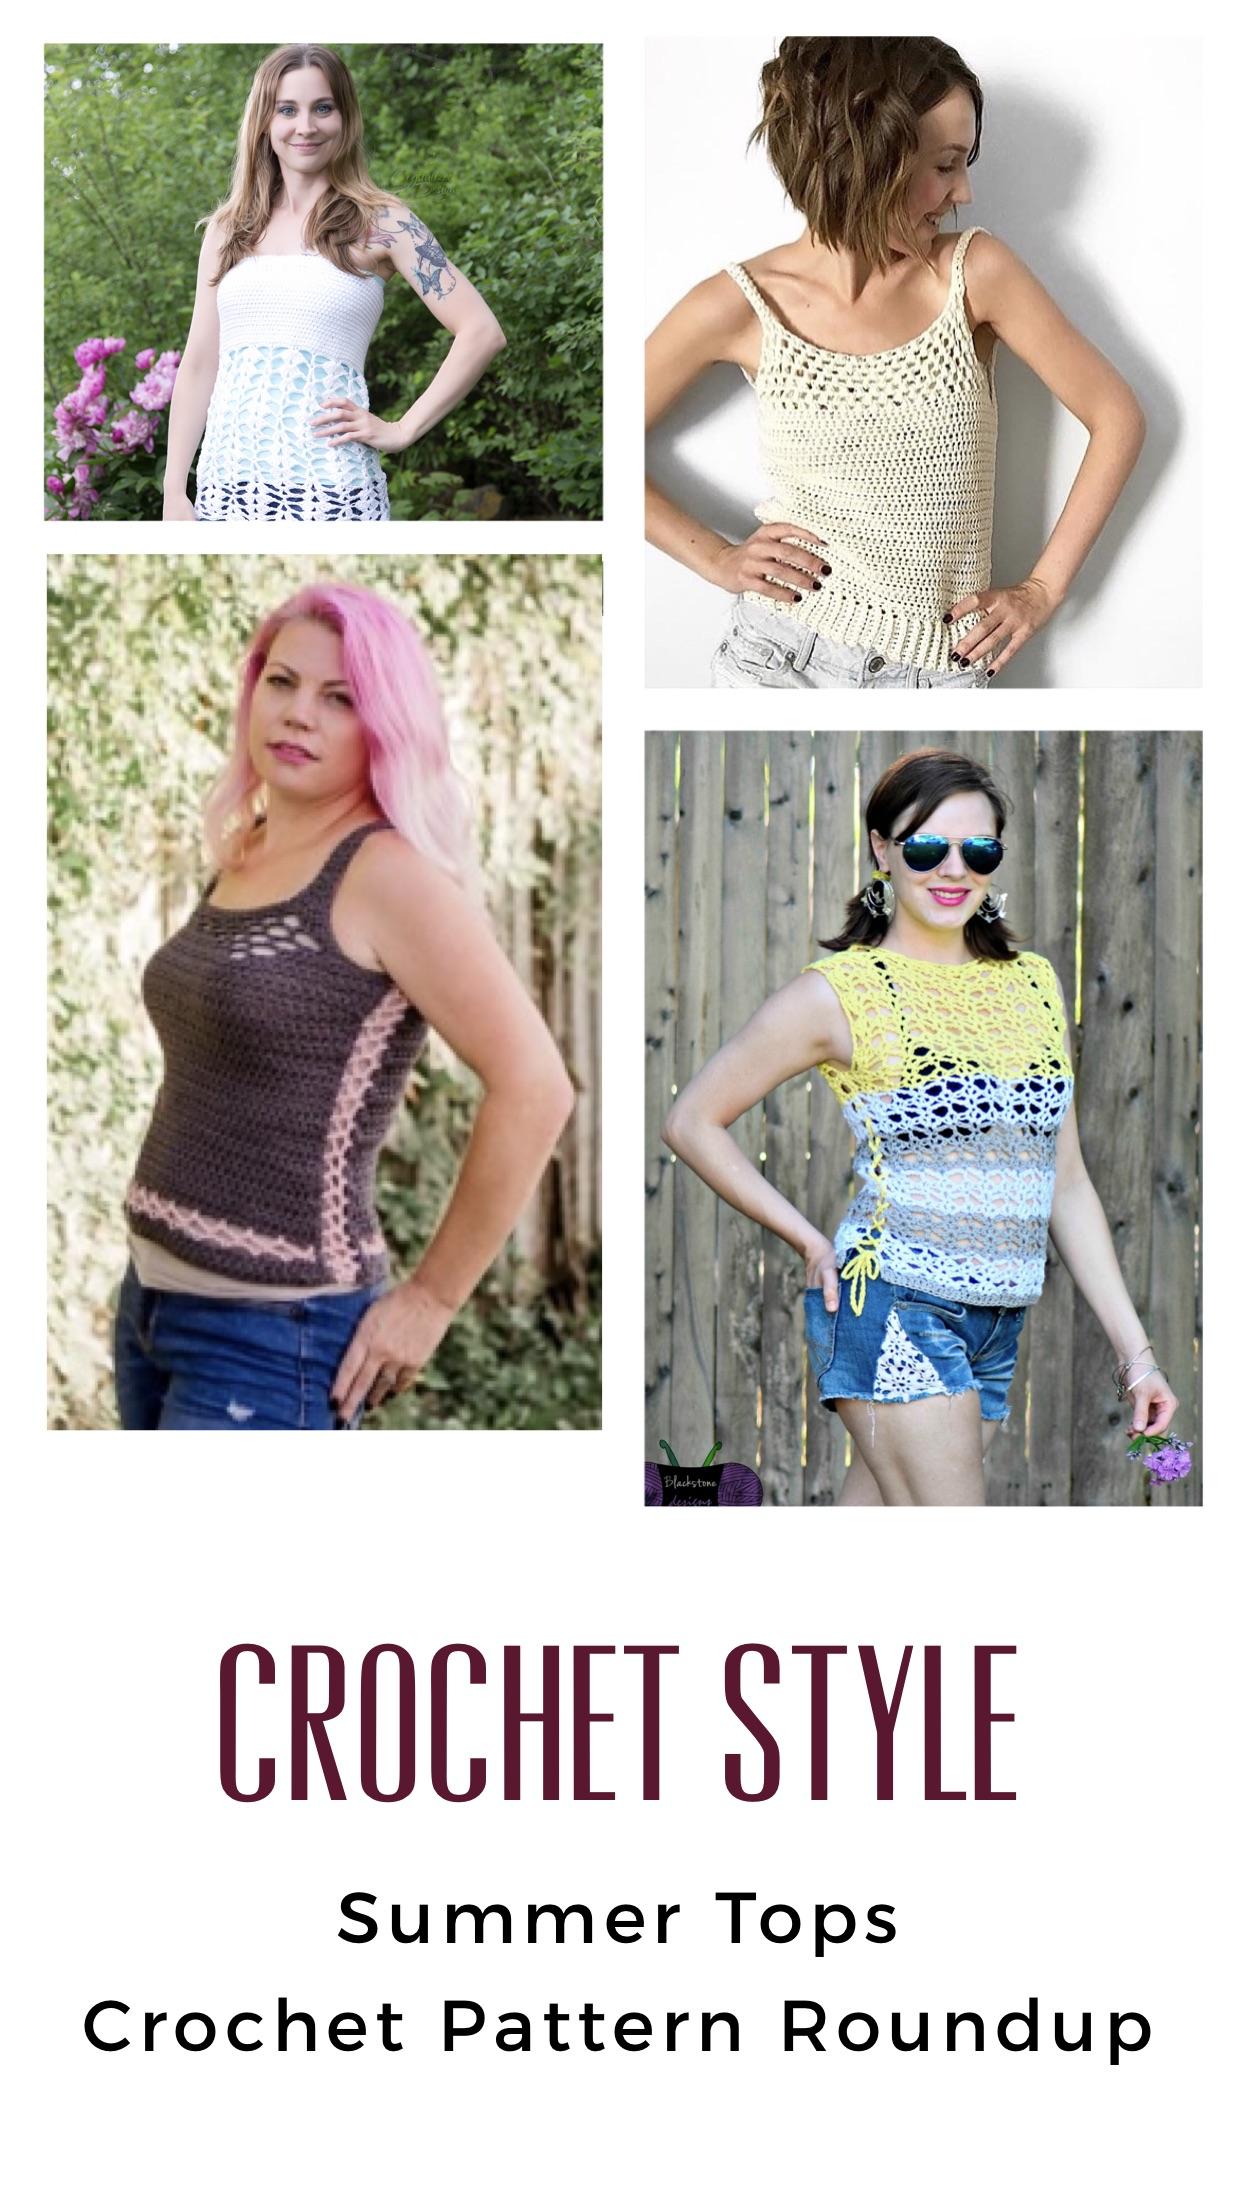 SummerTops_Crochet_Pattern_RoundUp_1f.jpg